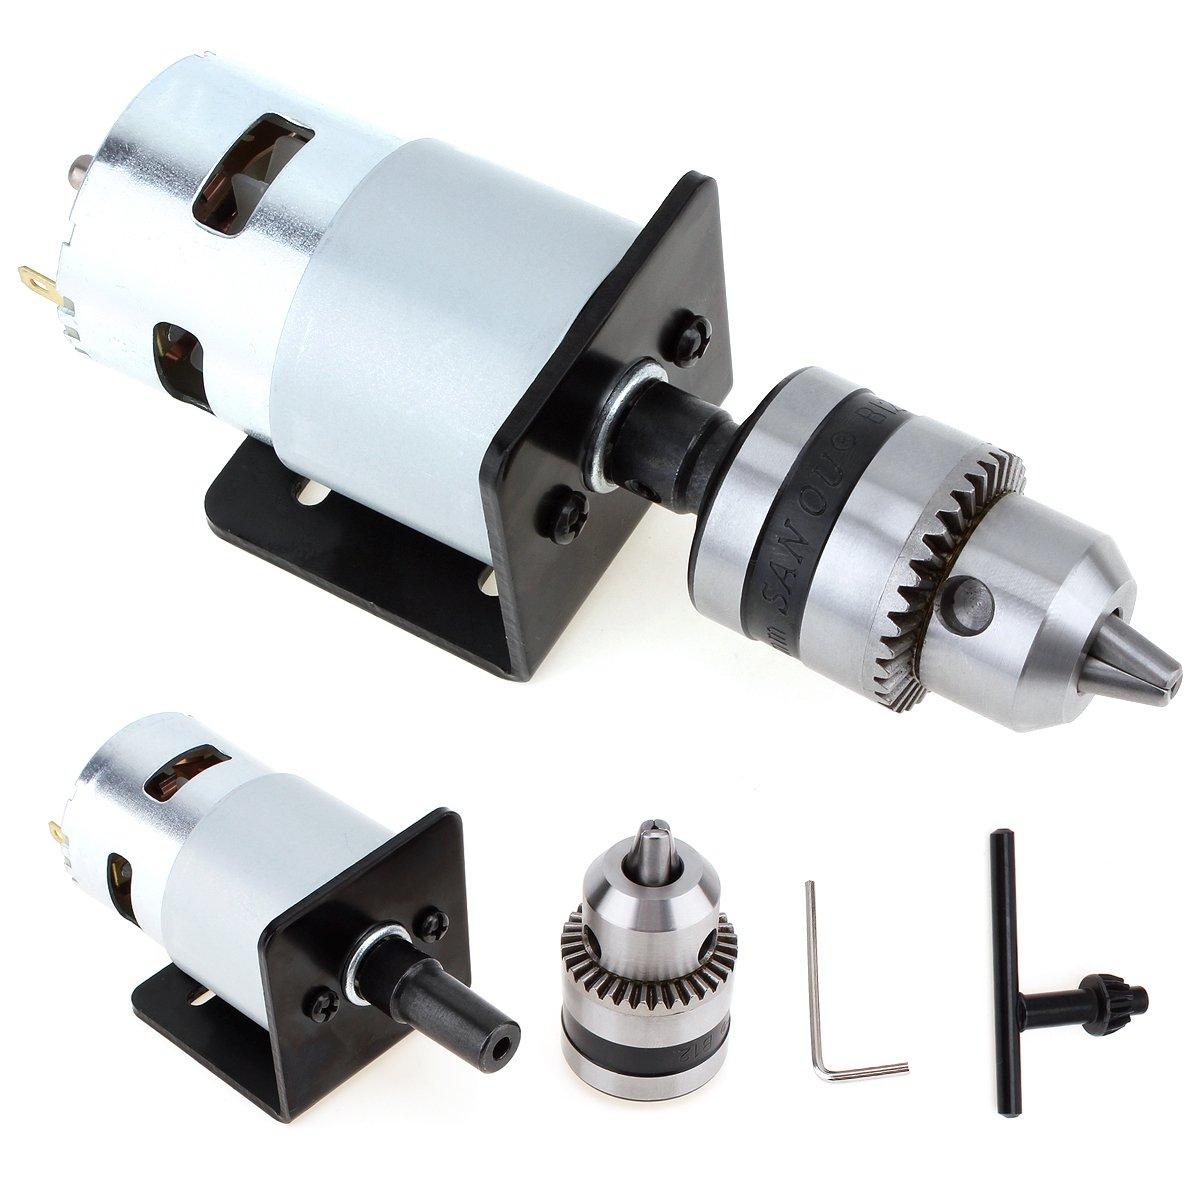 【The Best Deal】OriGlam 12-24V Mini Hand Drill Bits, DIY Lathe Press Motor Chuck and Mounting Bracket